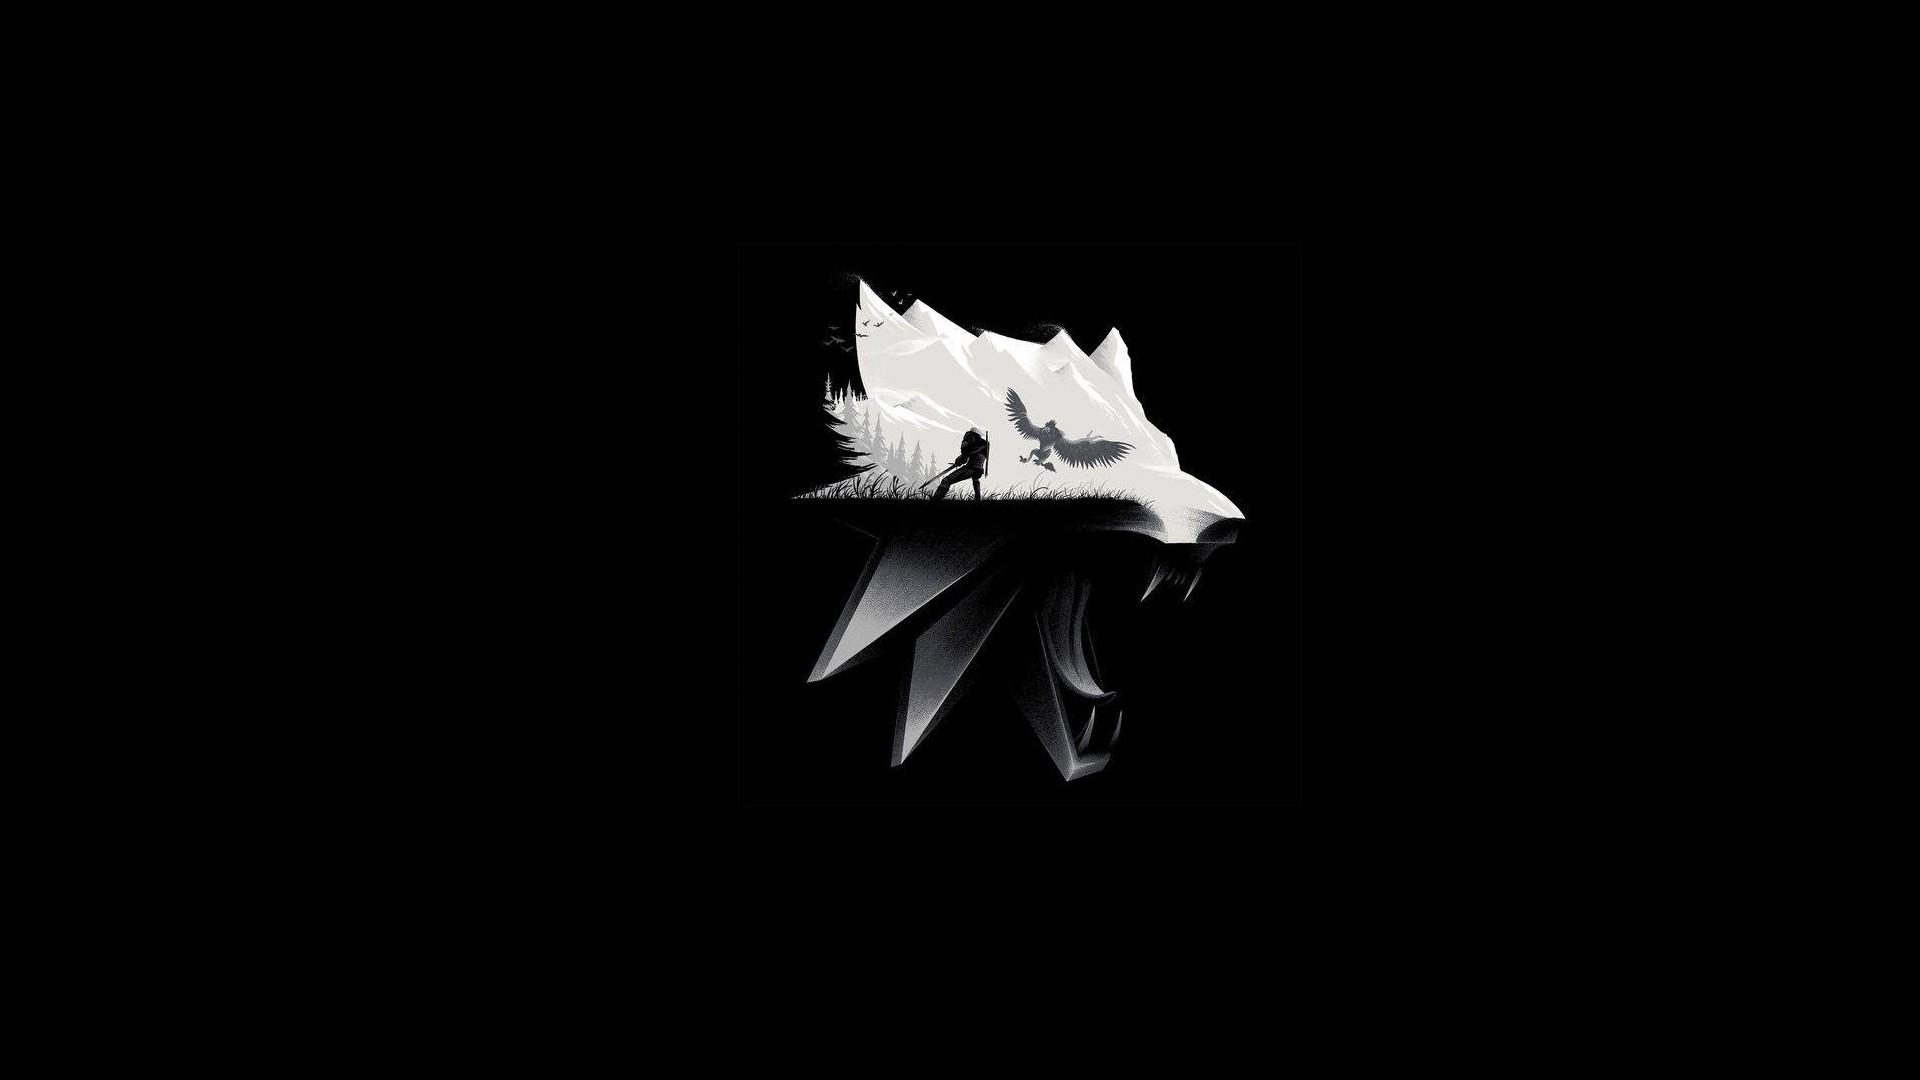 1920x1080 px animals dark fangs minimalism monochrome mountains simple background The Witcher The Witcher 3 Wild